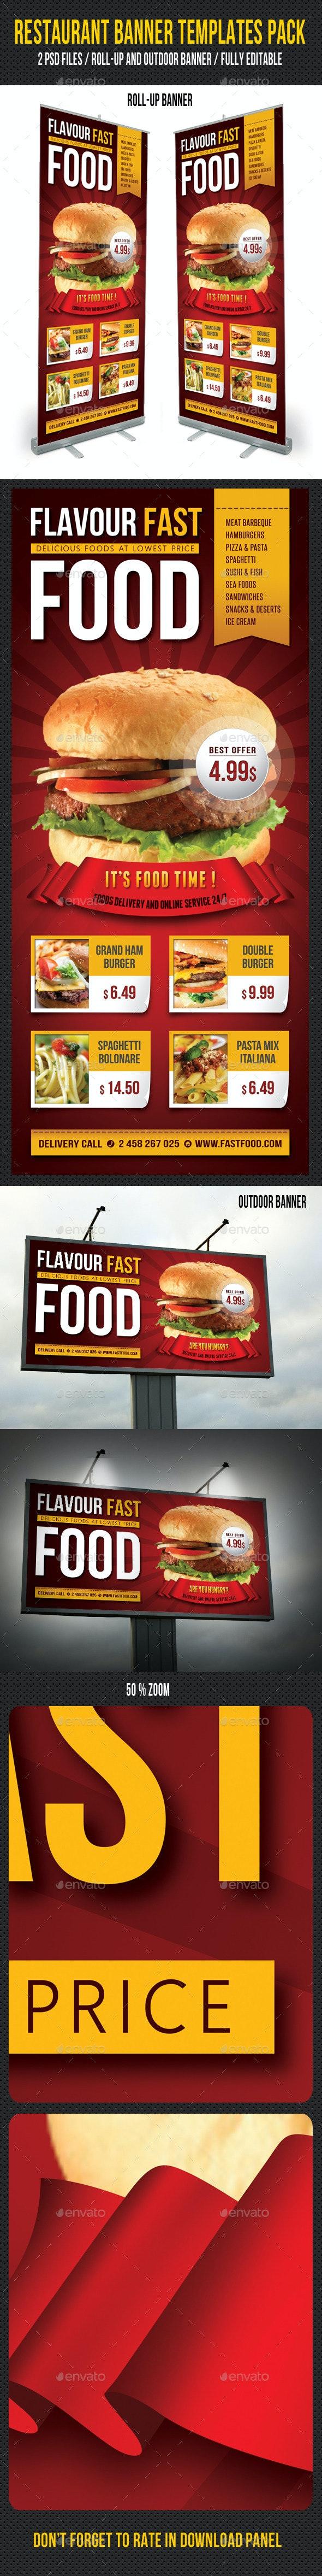 Restaurant Banner Templates Pack - Signage Print Templates